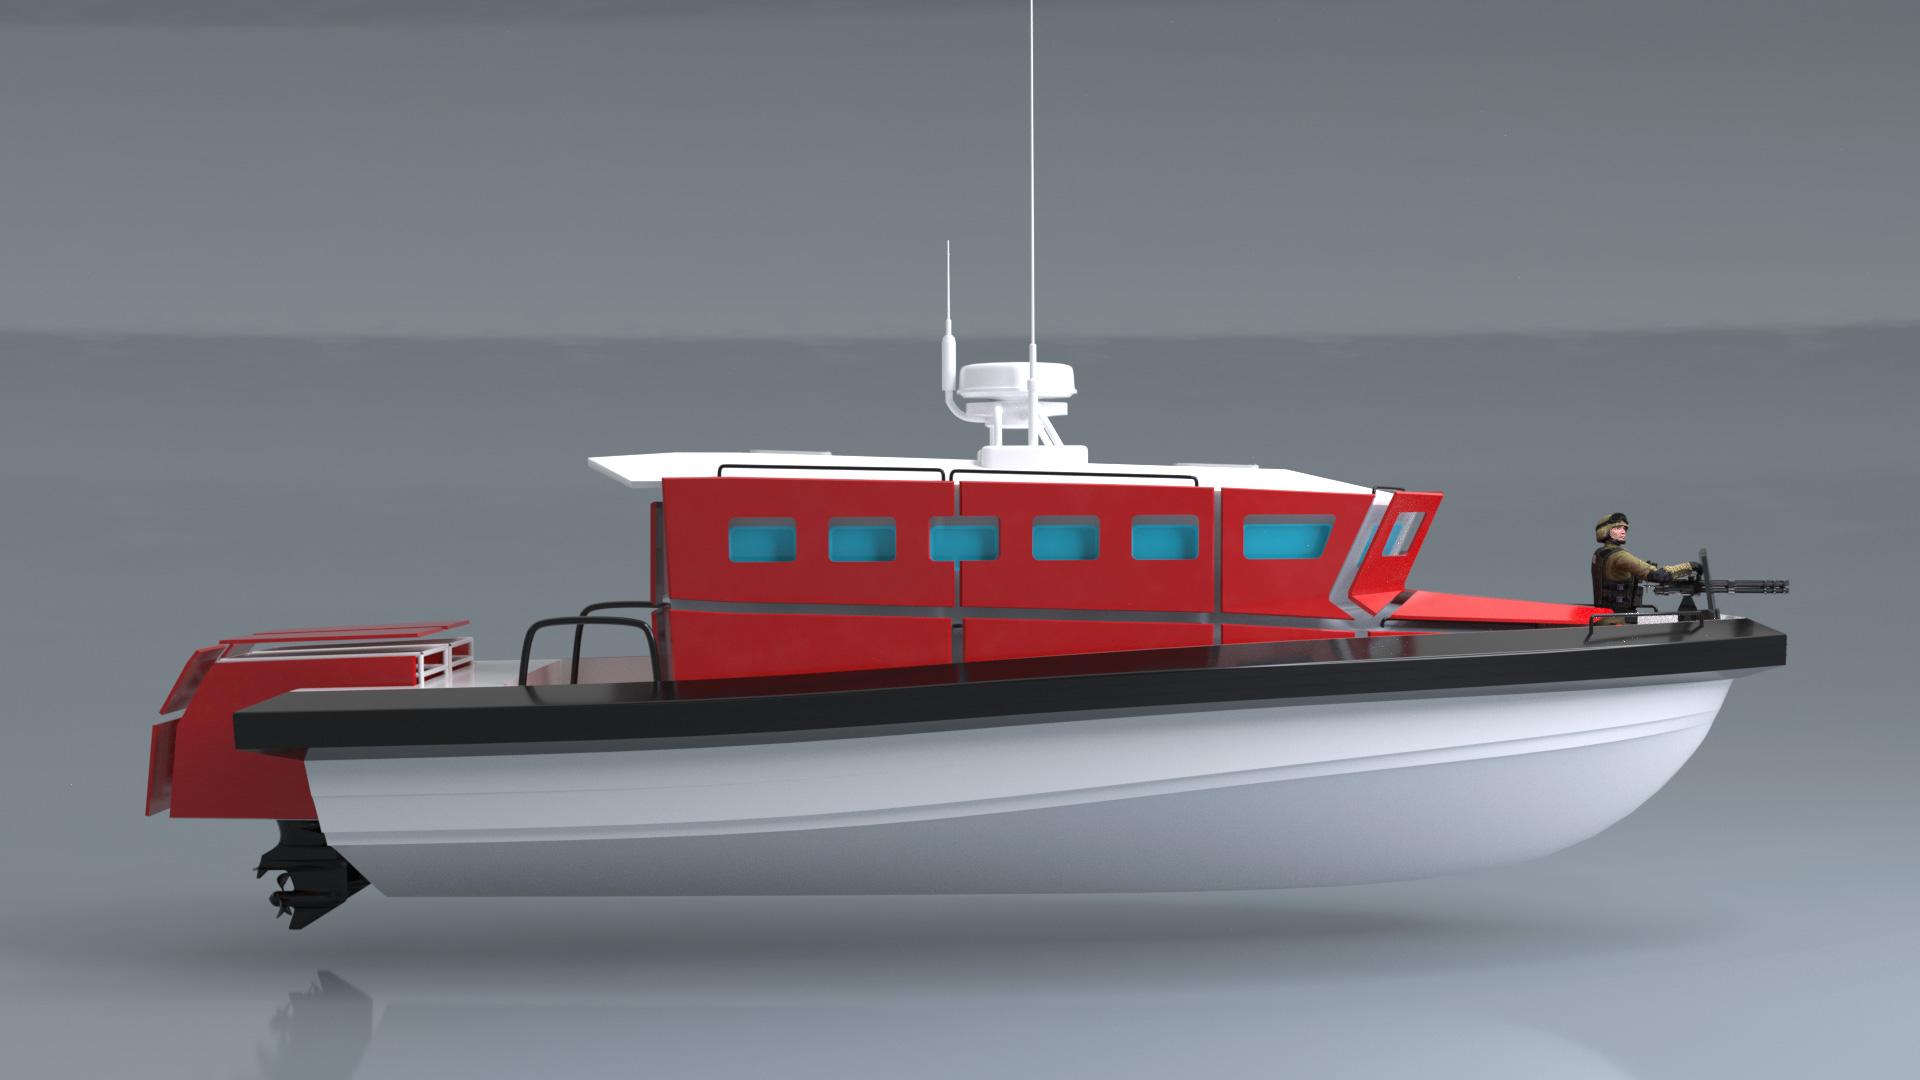 projekt 3 d łodzi